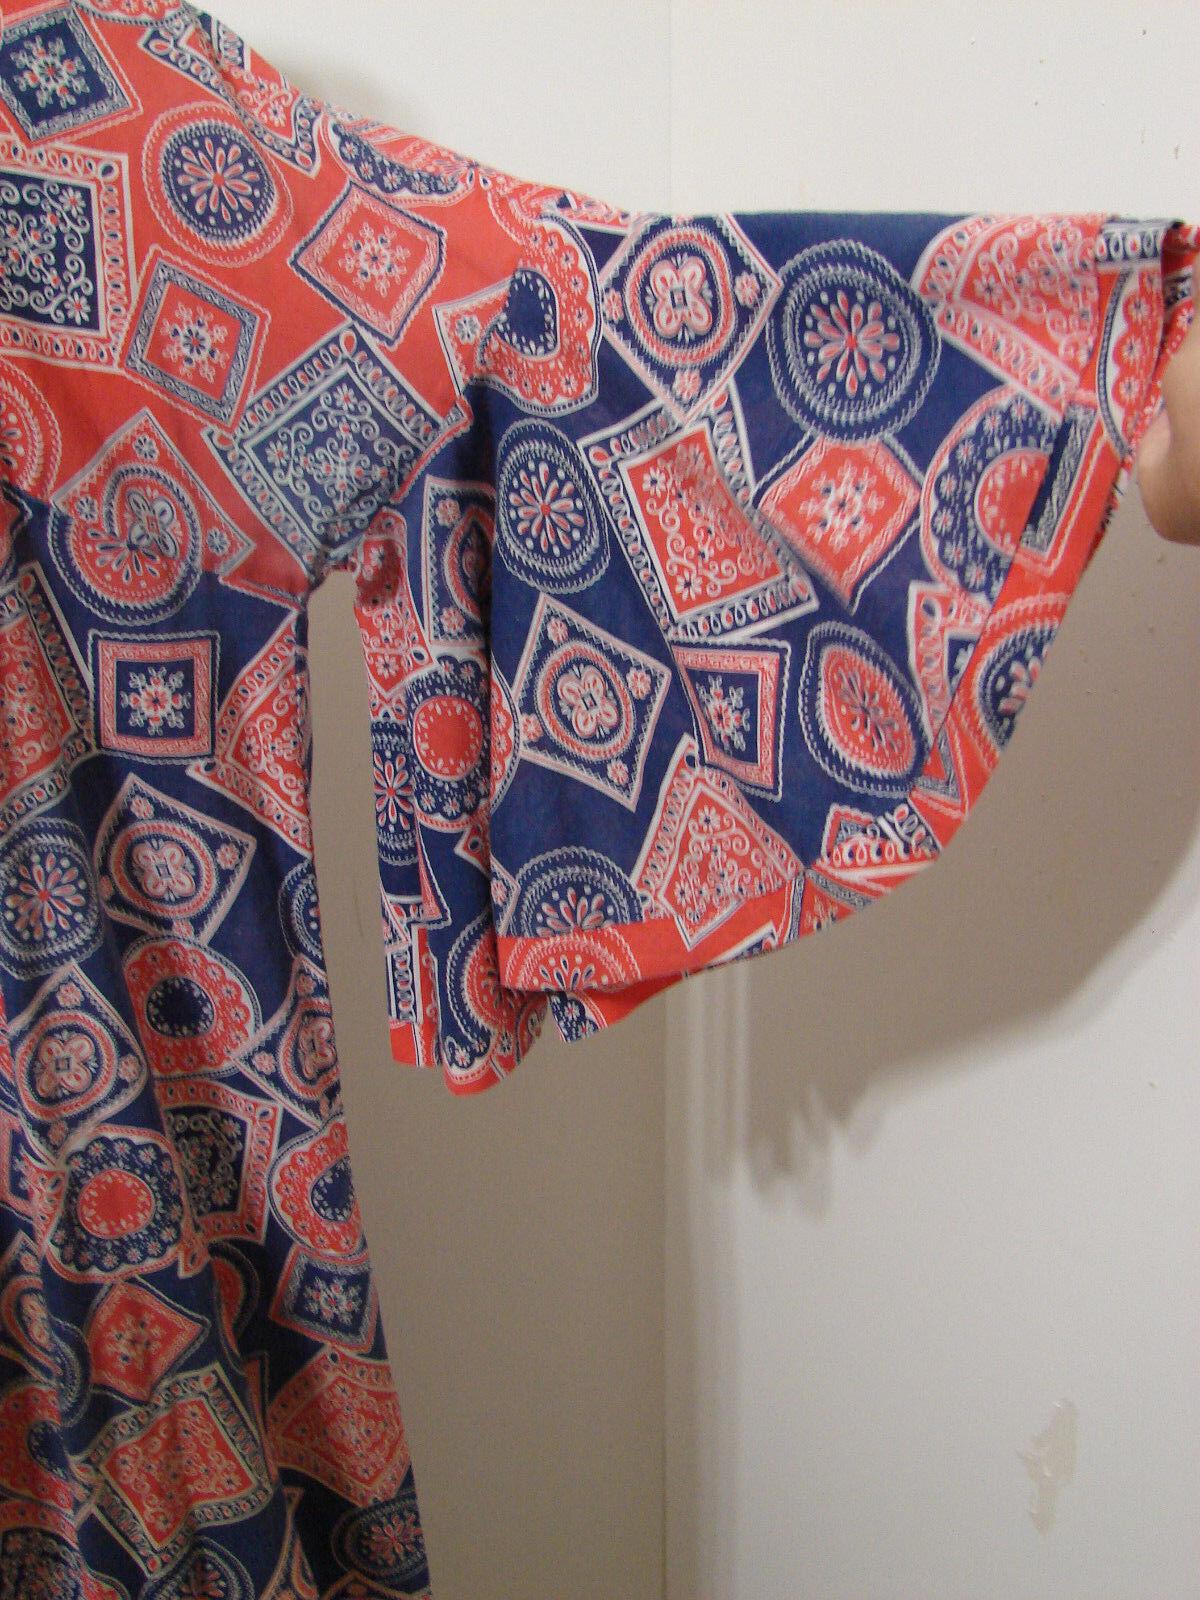 PEGGY LOU Caftan Dress Vintage 1960's Groovy Patc… - image 4